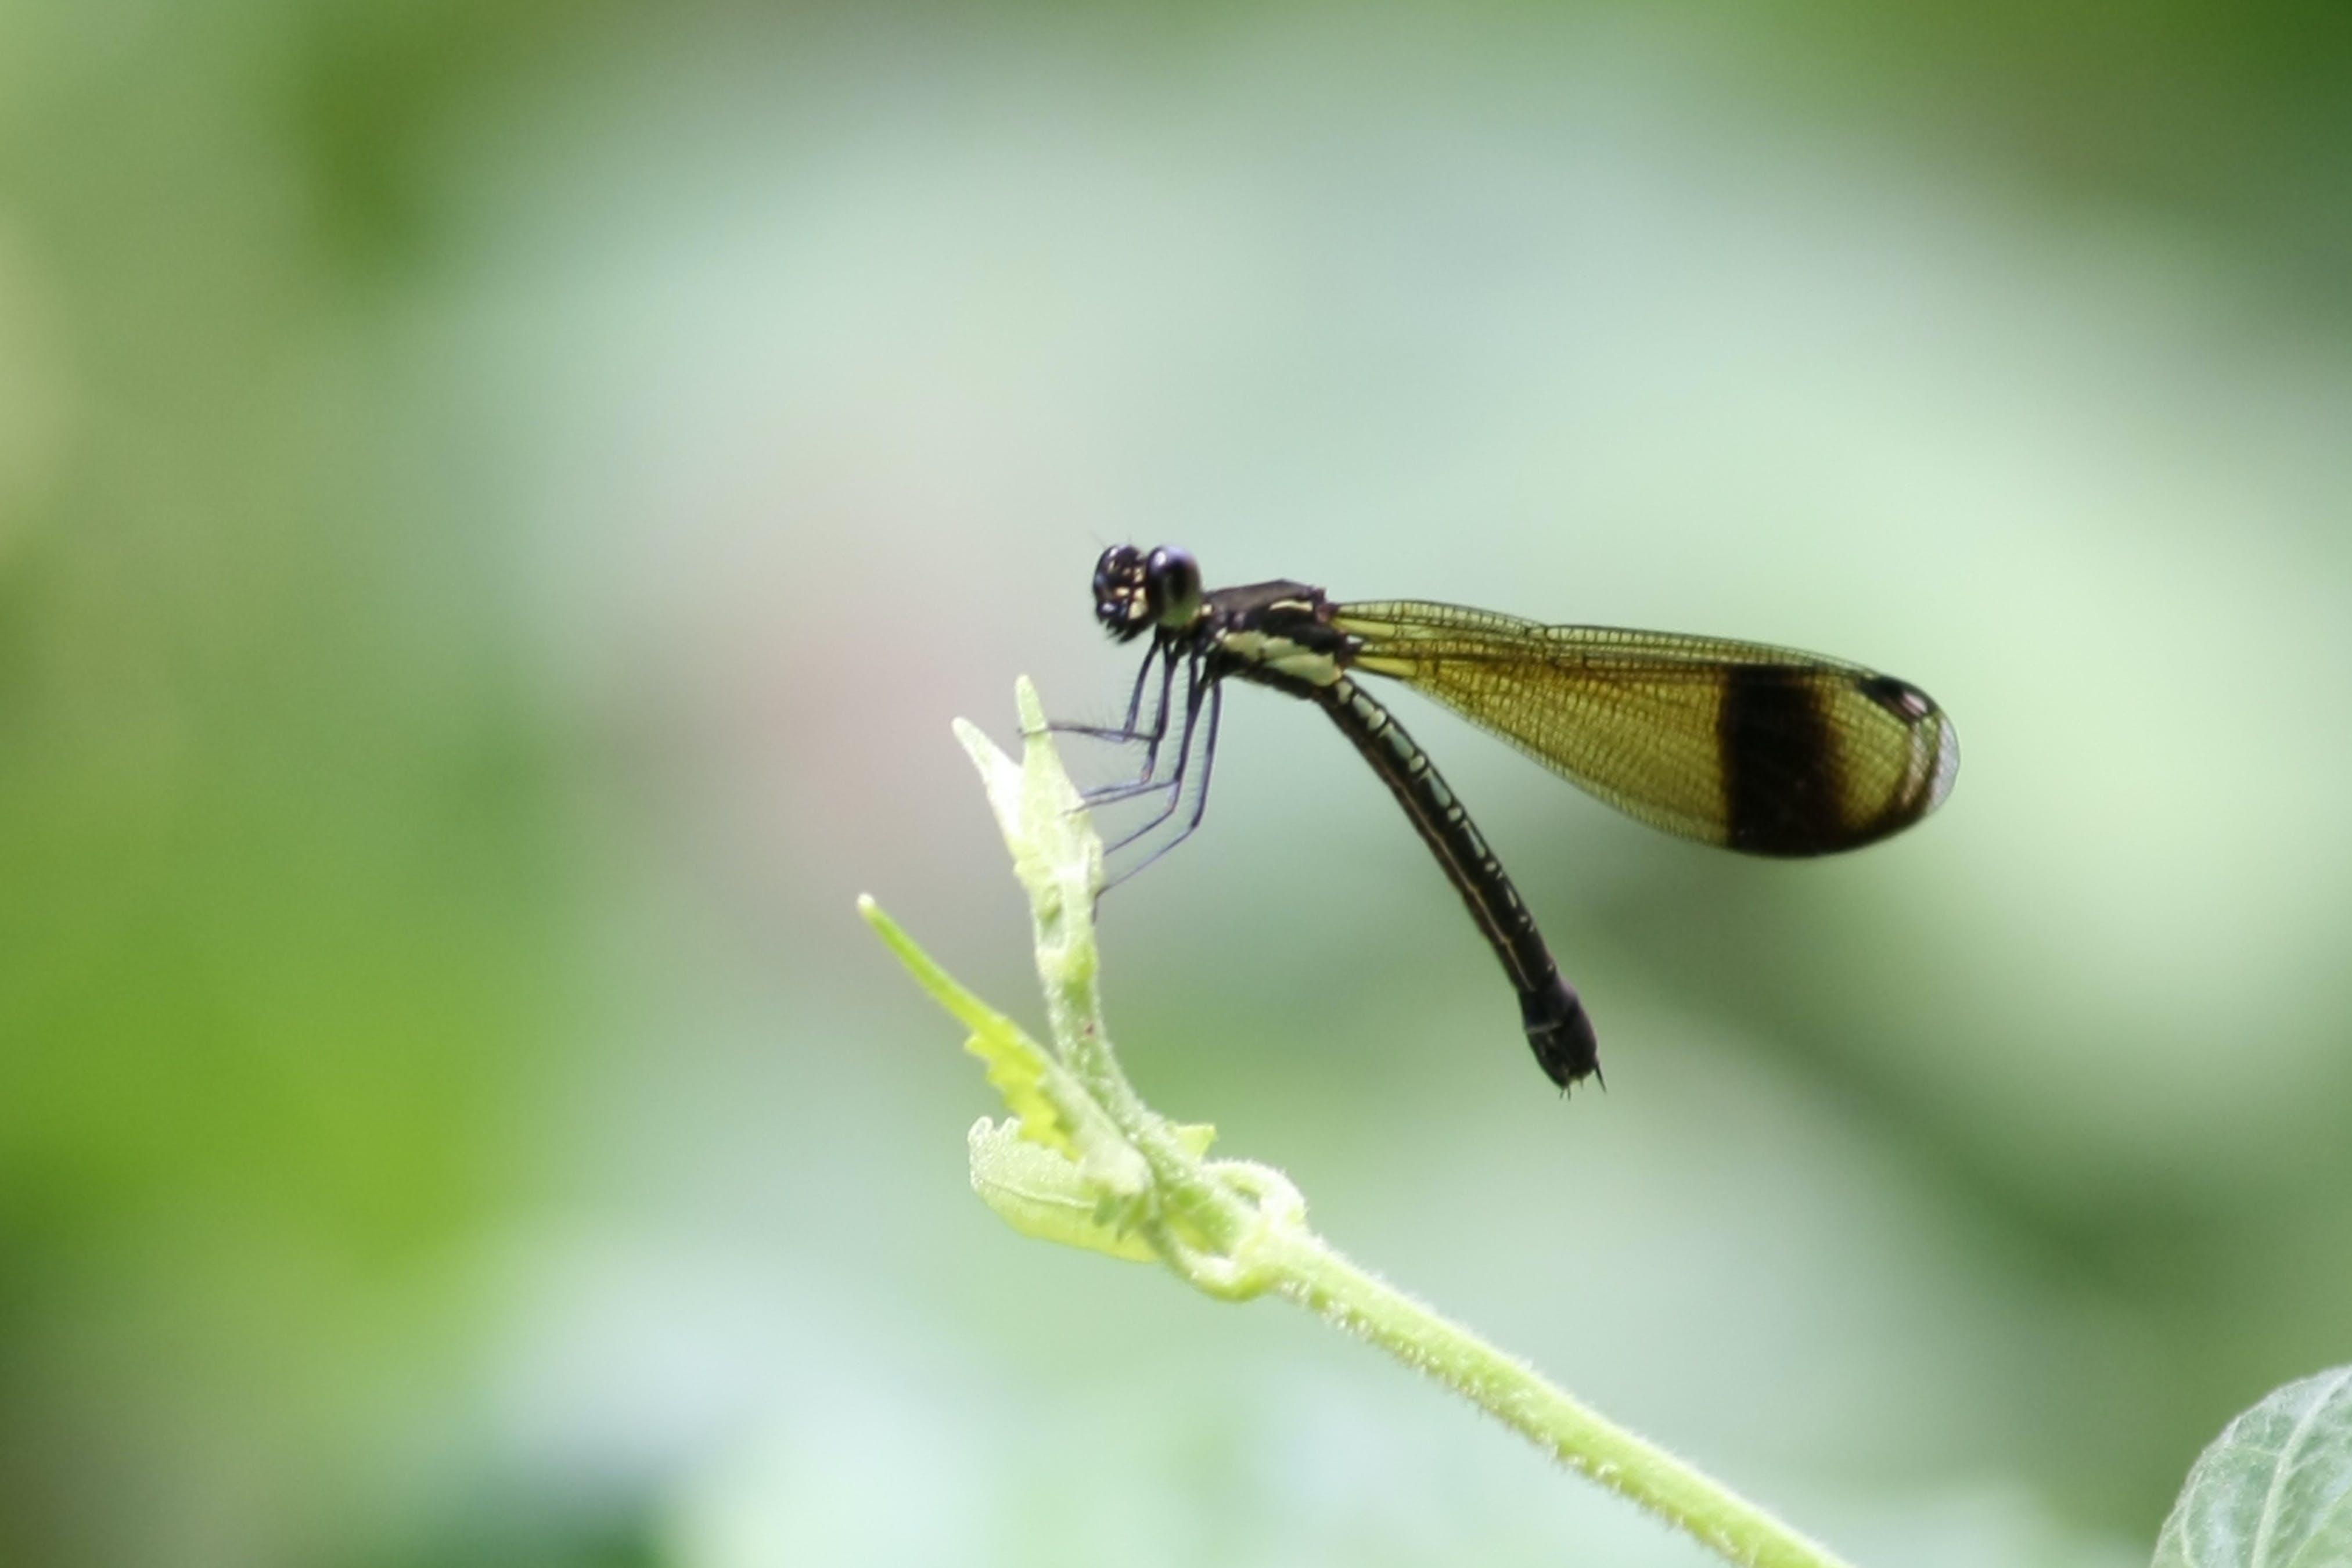 Kostenloses Stock Foto zu natur, pflanze, insekt, makro